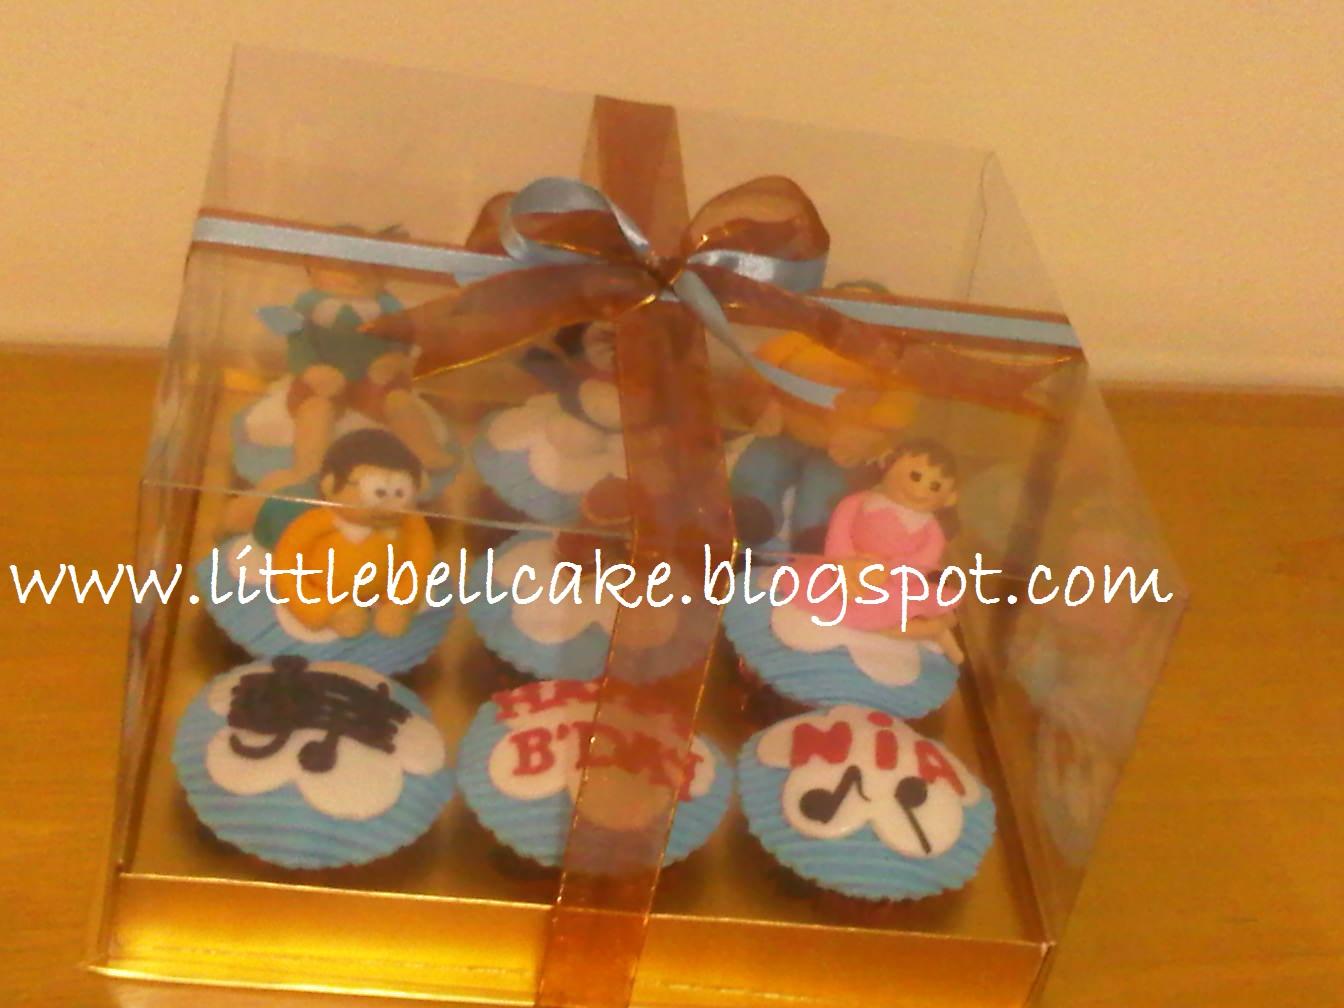 Japanese Dora Cake Recipe: Little Bell Cake, Cookies & Bento: Doraemon Cup Cakes